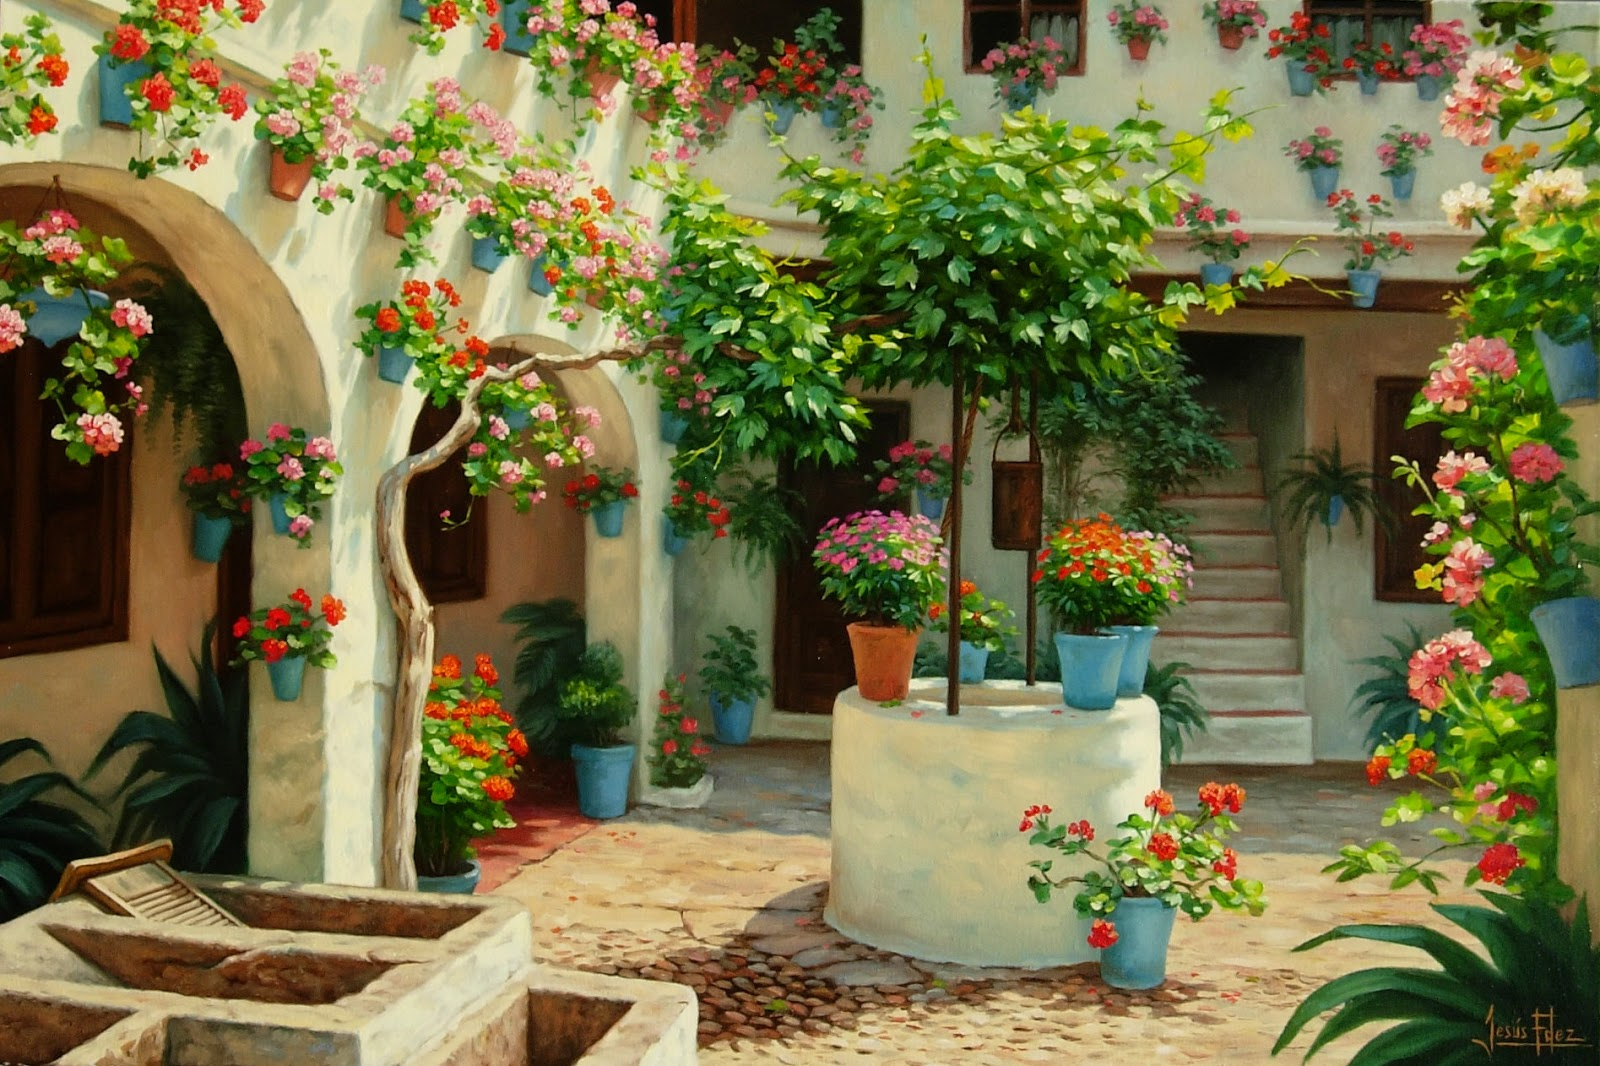 Jes s fern ndez pintor patio cordob s con pozo - Fotos patio andaluz ...